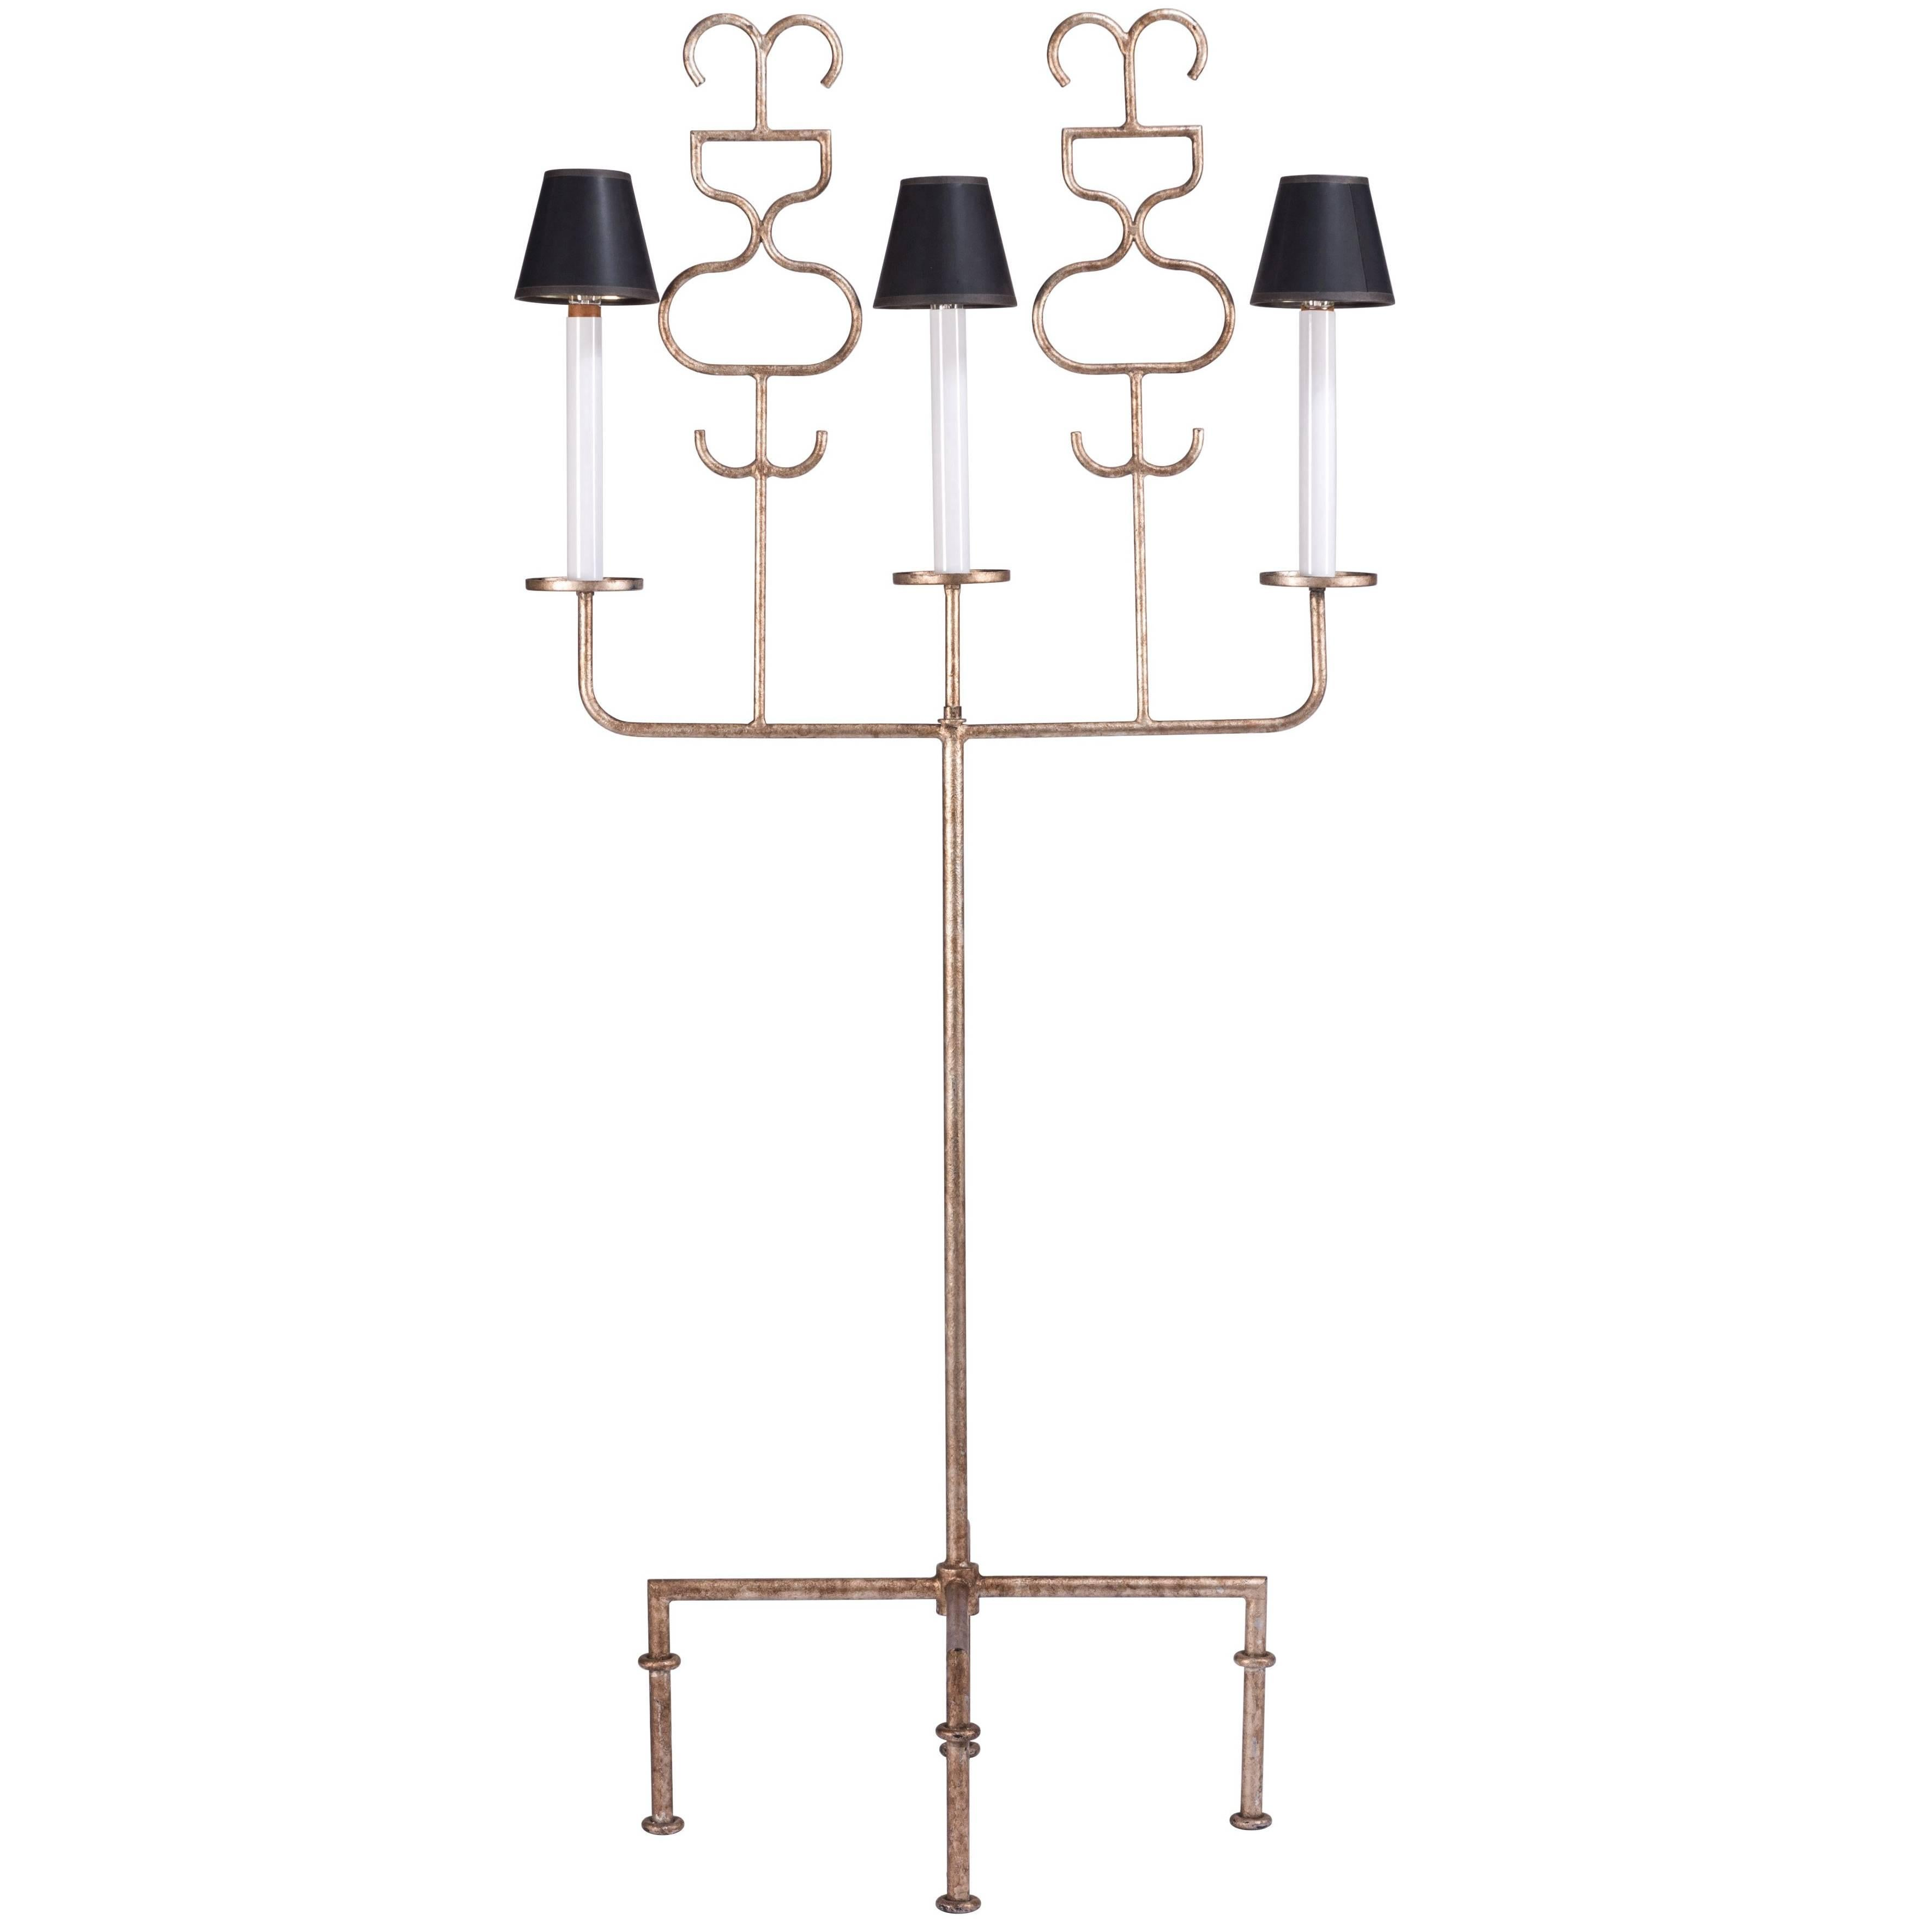 Tommi Parzinger Floor Lamp for Parzinger Originals